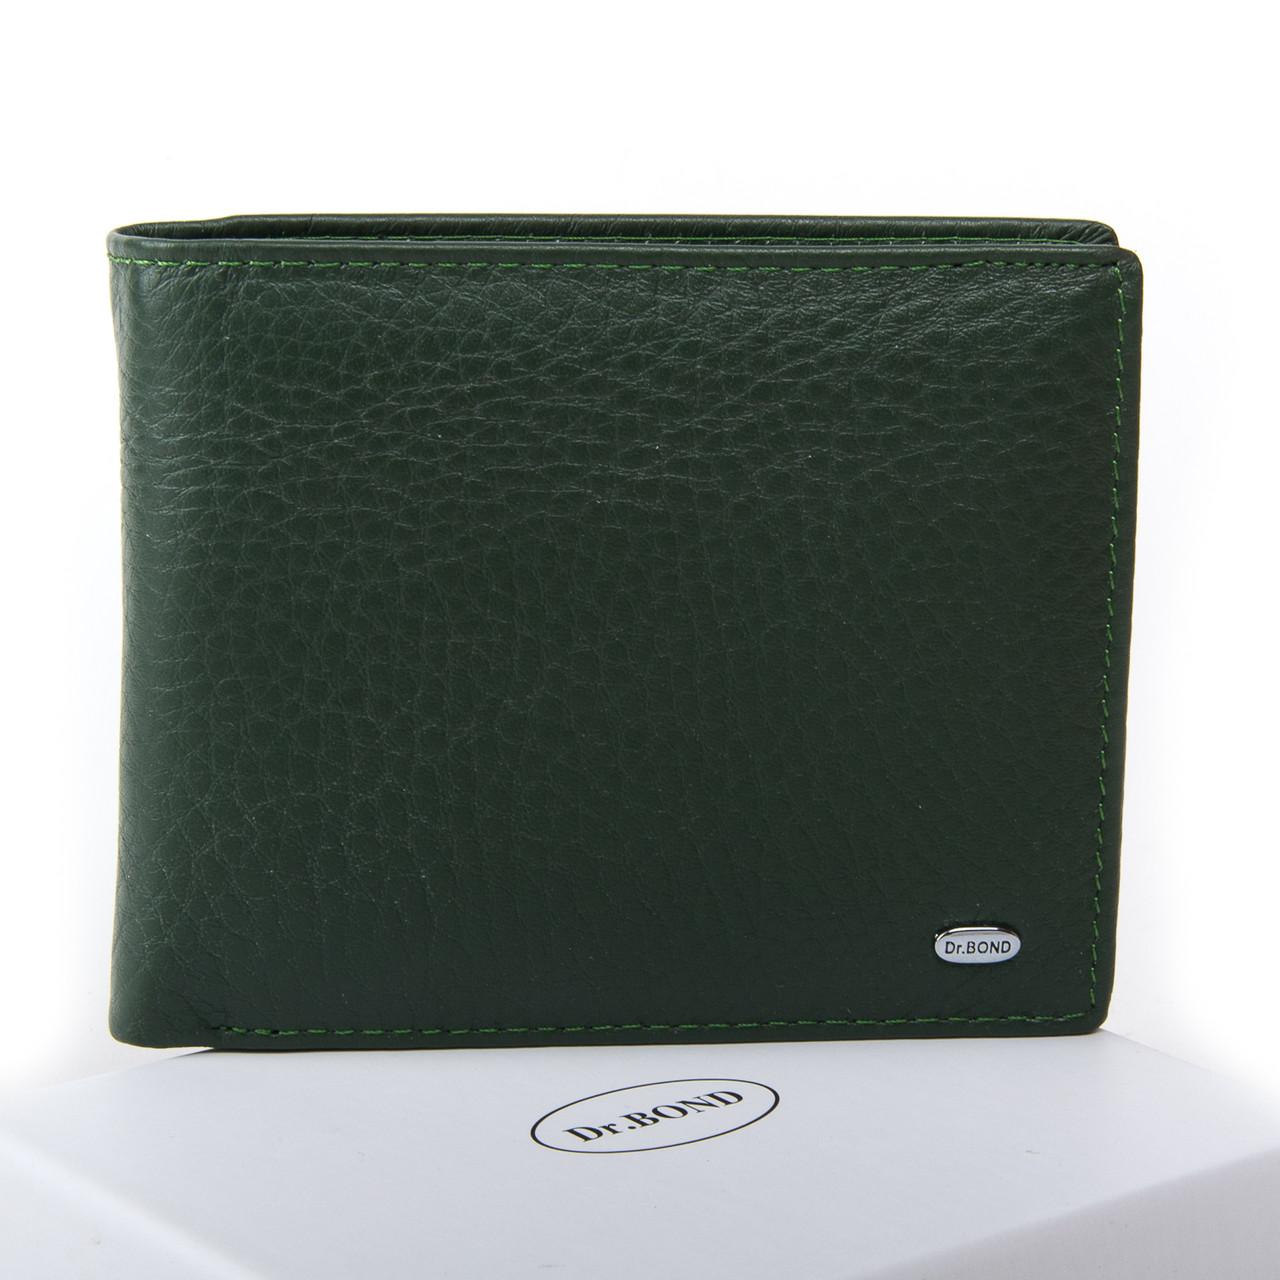 Жеснкий кошелек Classic кожа DR. BOND WN-7 зеленый